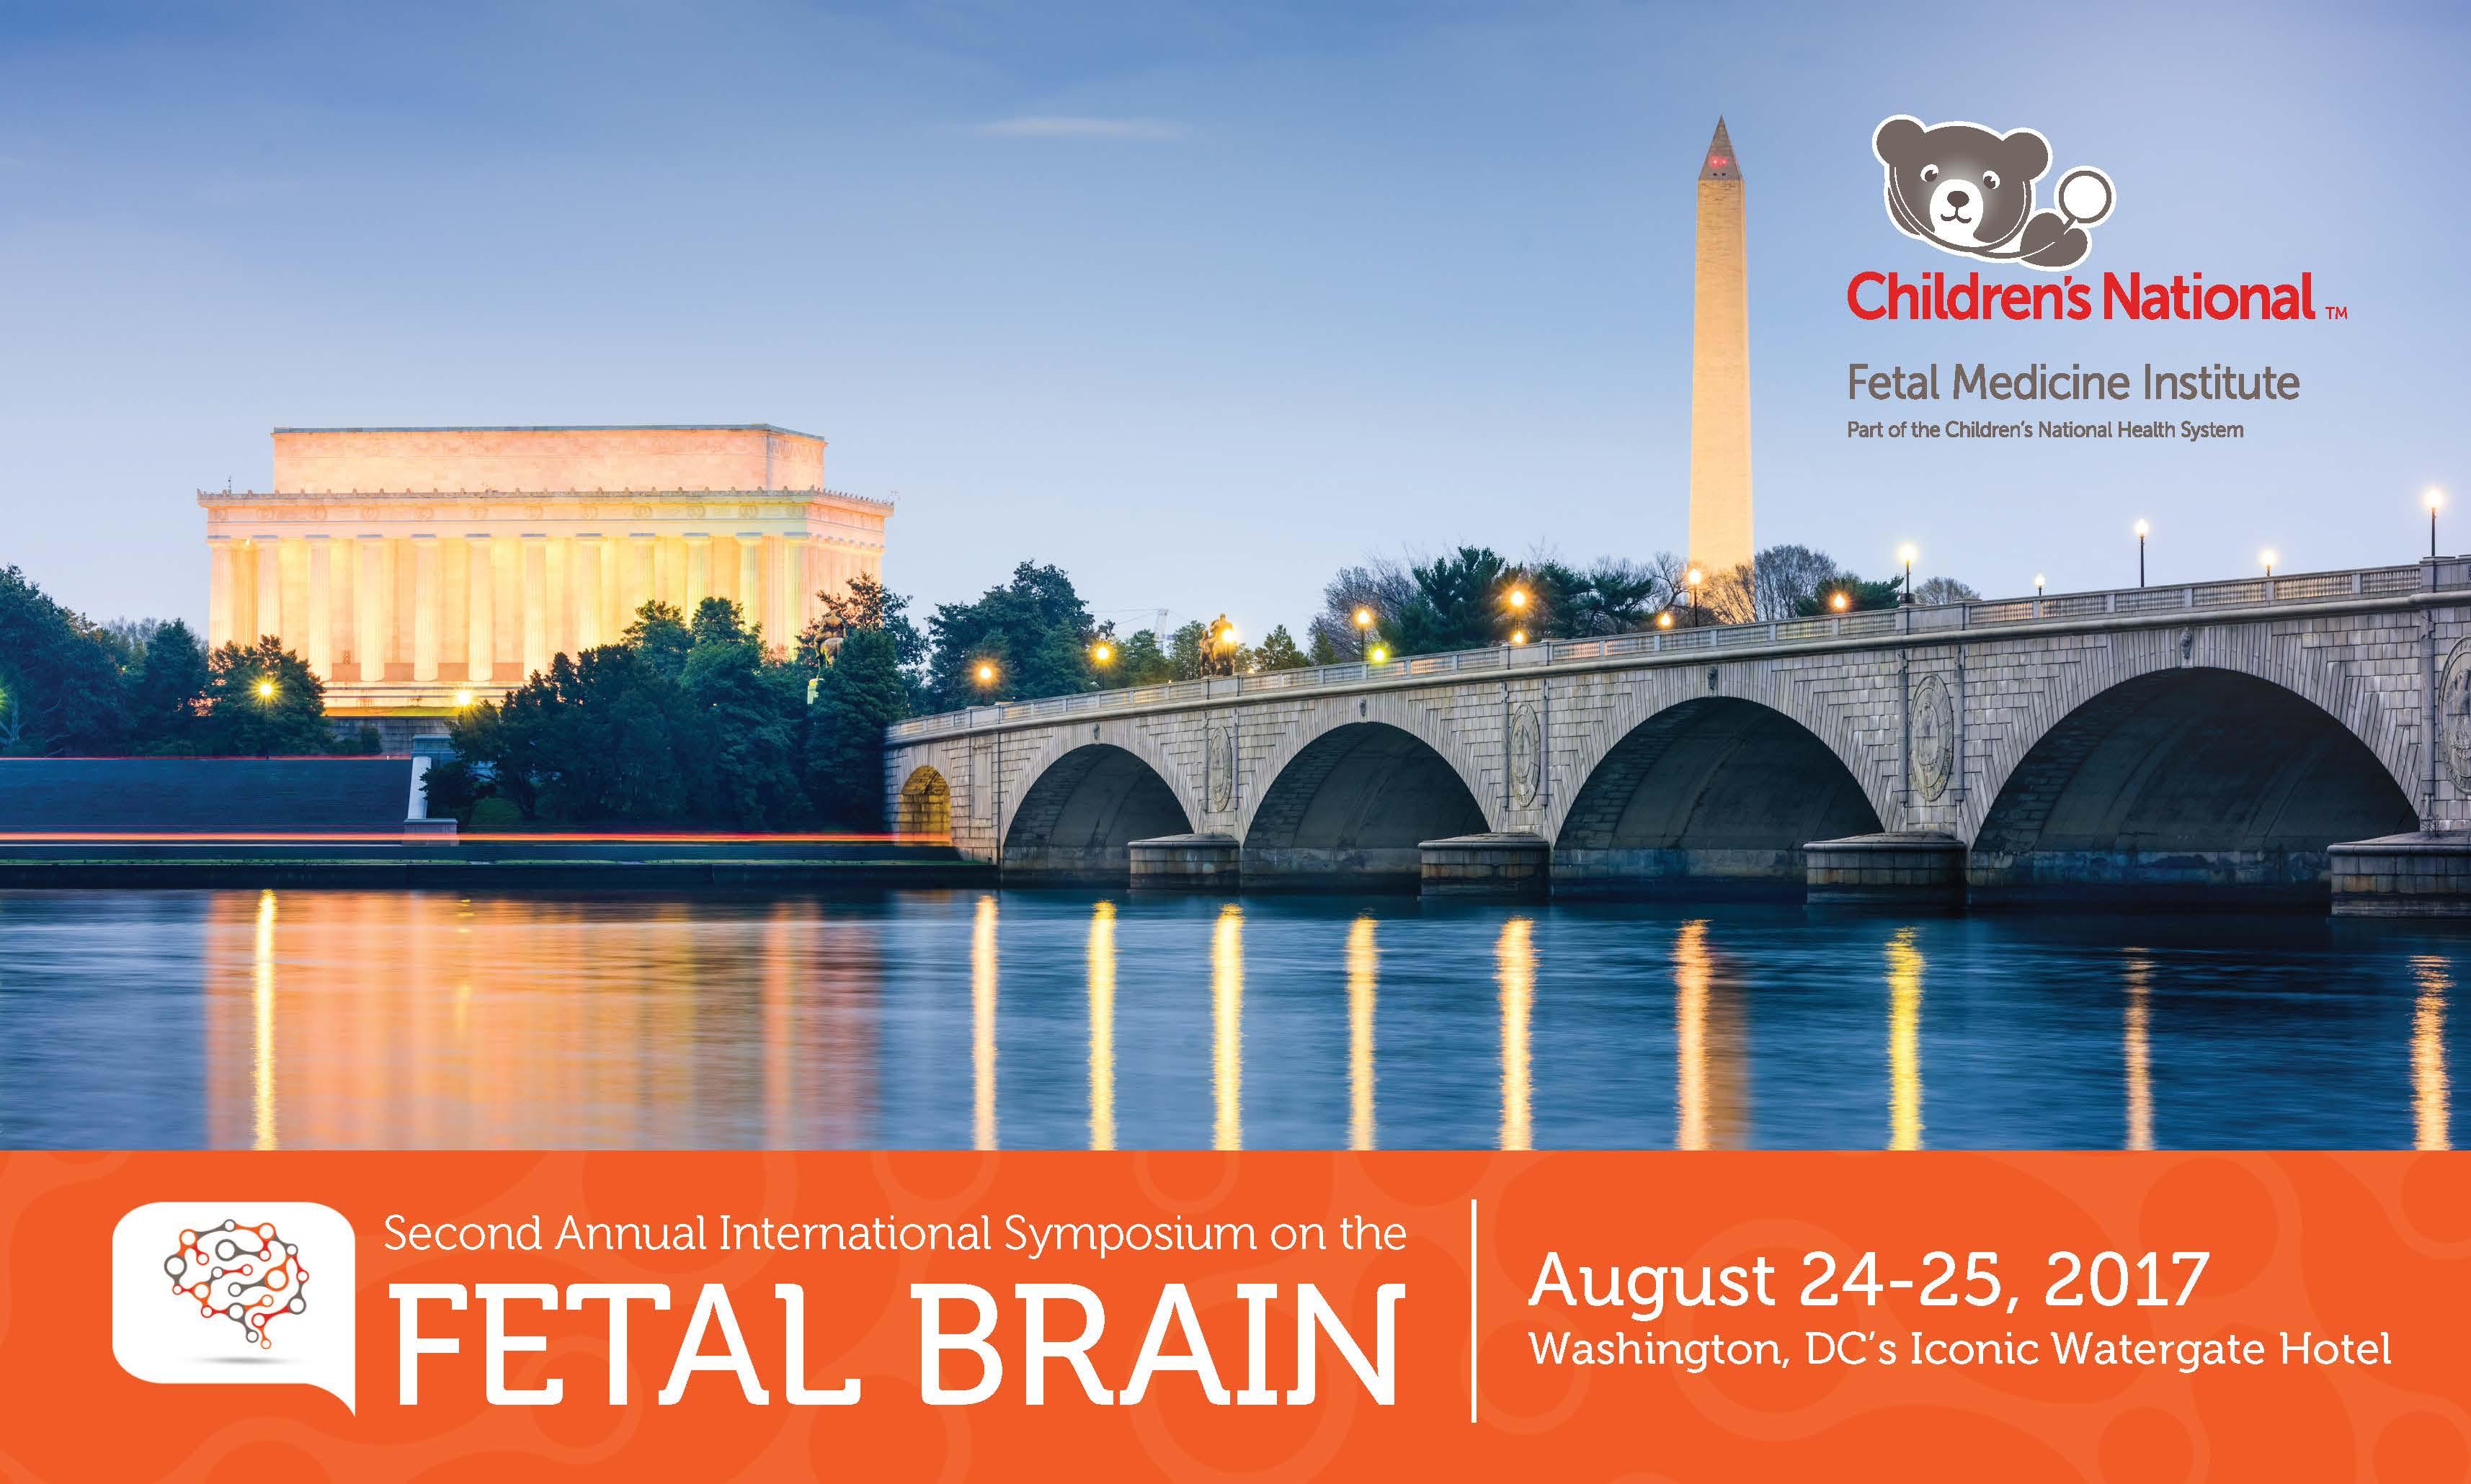 Second Annual International Symposium on the Fetal Brain